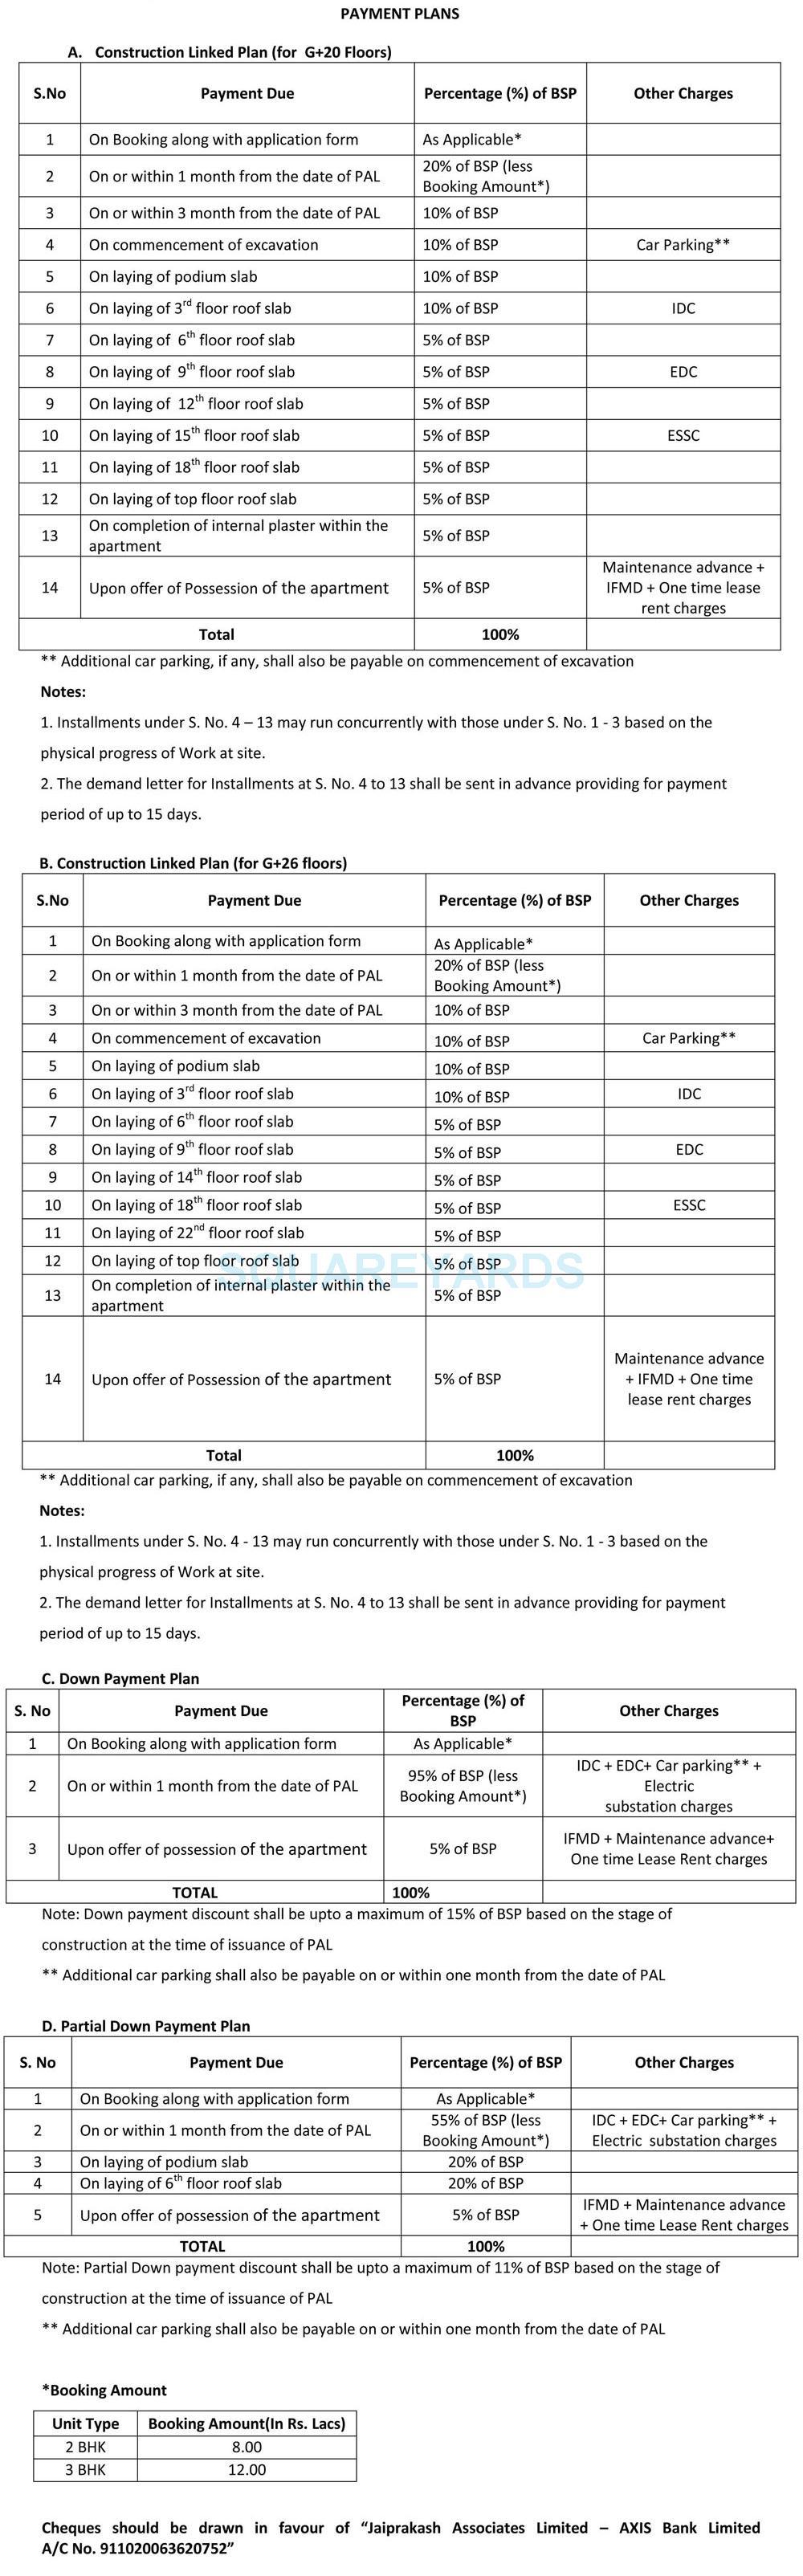 jaypee kristal court payment plan image1